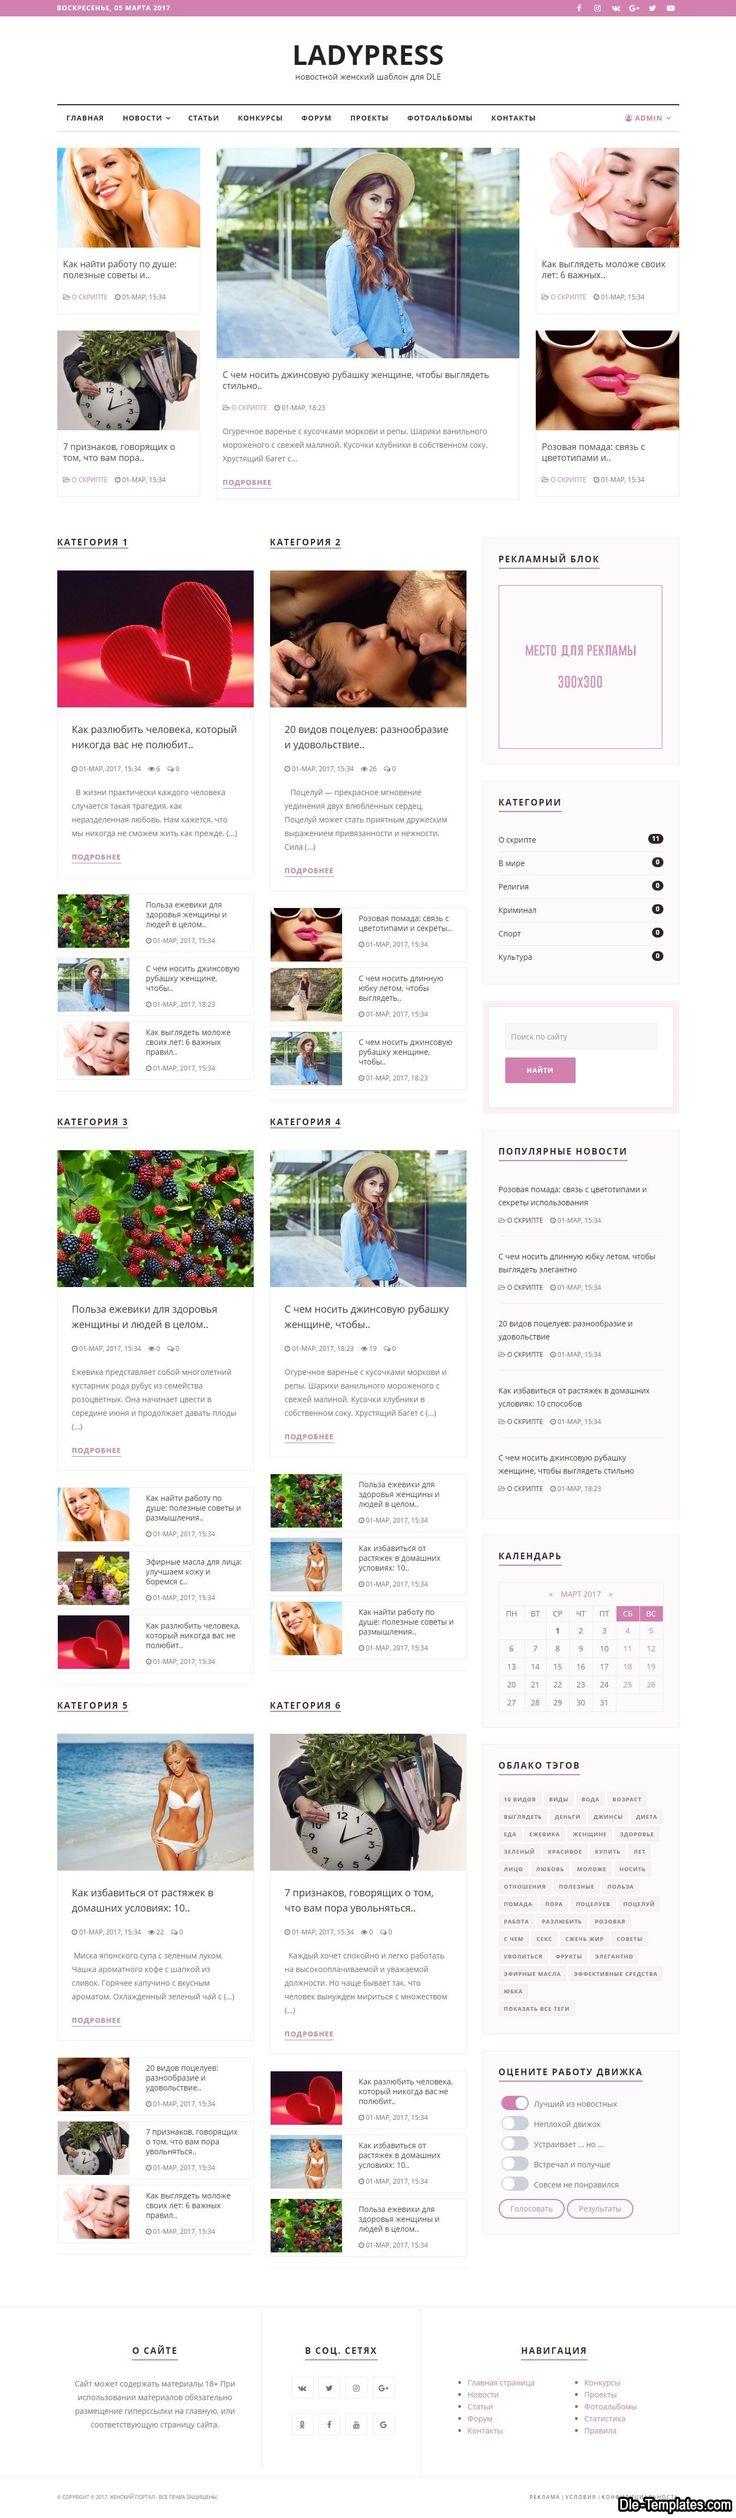 LadyPress - адаптивный женский шаблон для DLE #templates #website #шаблон #сайт #web